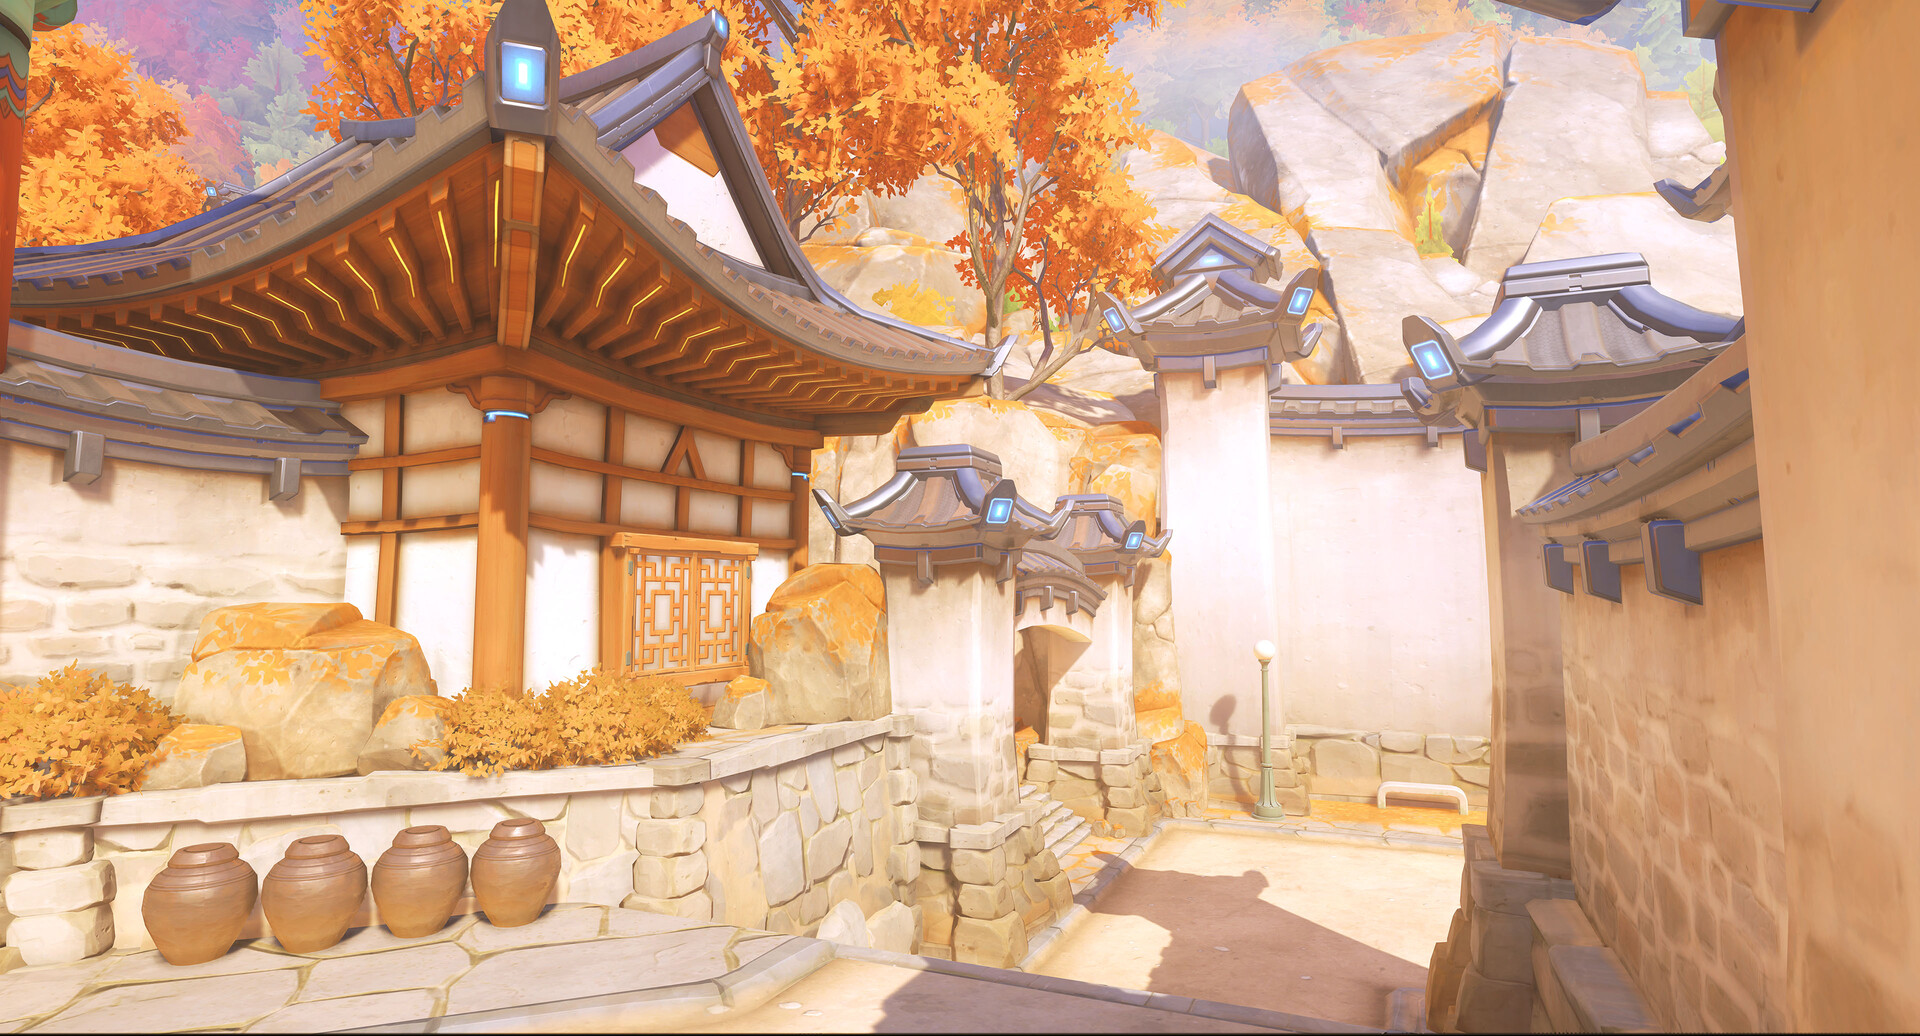 Helder pinto busan temple 11